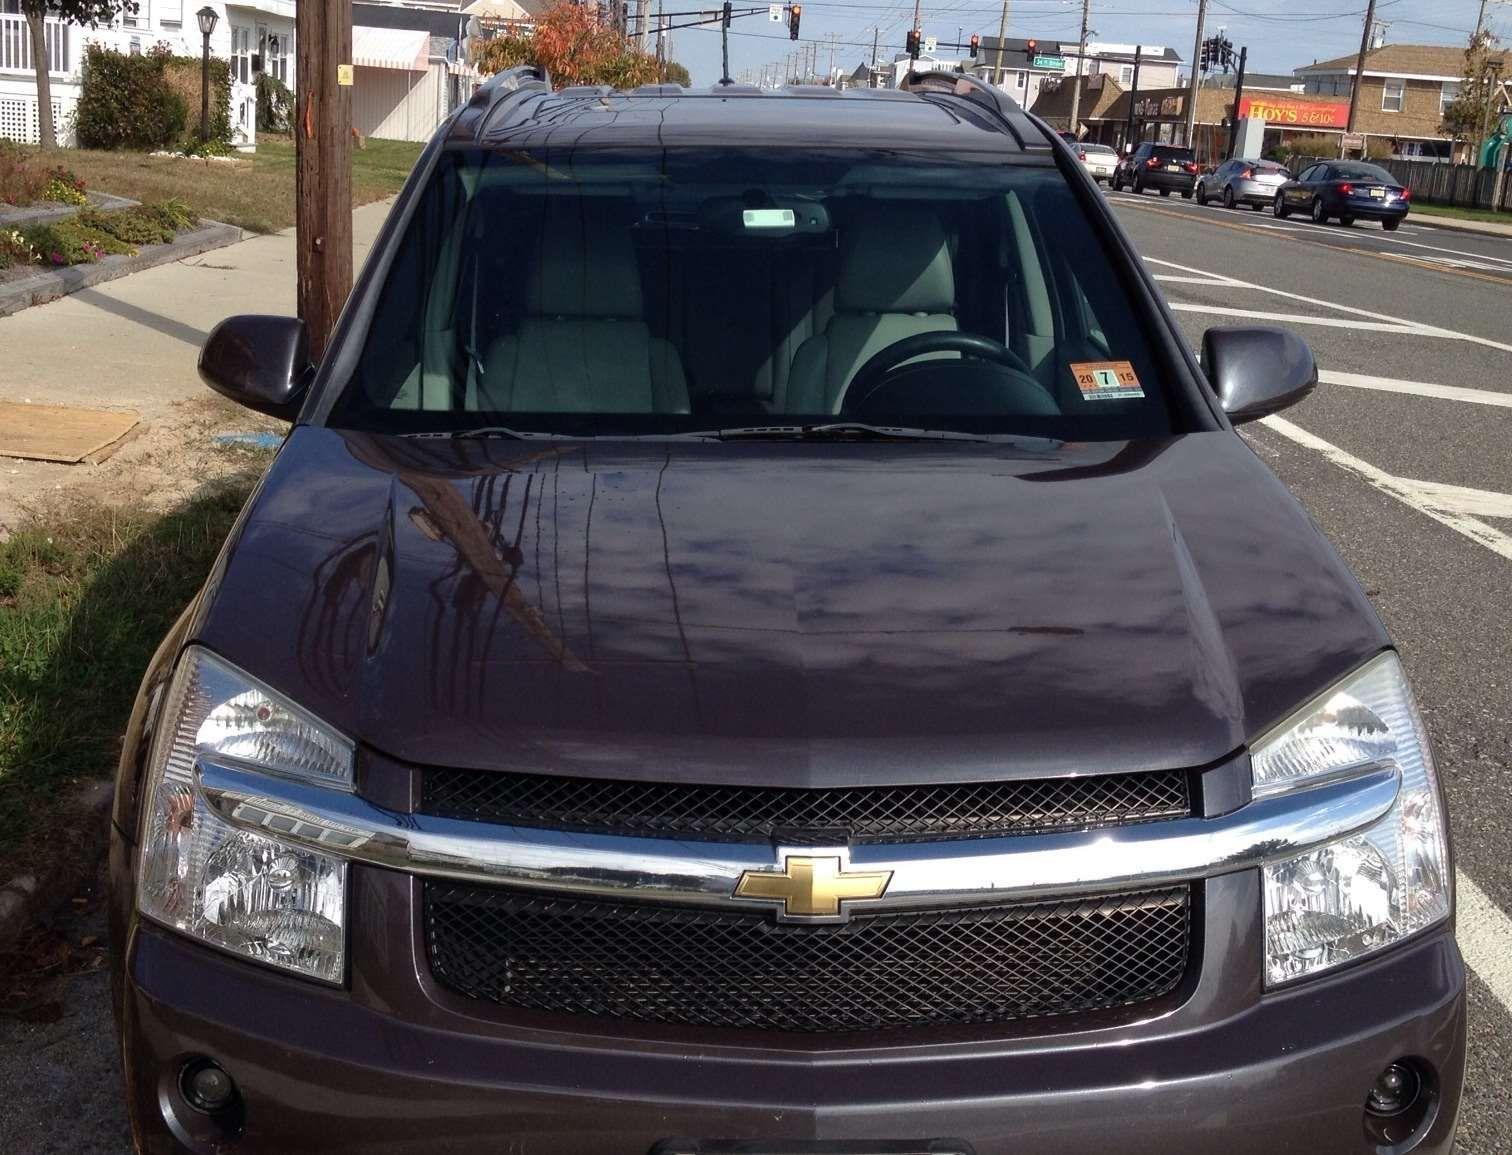 Equinox brown chevy equinox : Make: Chevrolet Model: Equinox Year: 2008 Body Style: Exterior ...